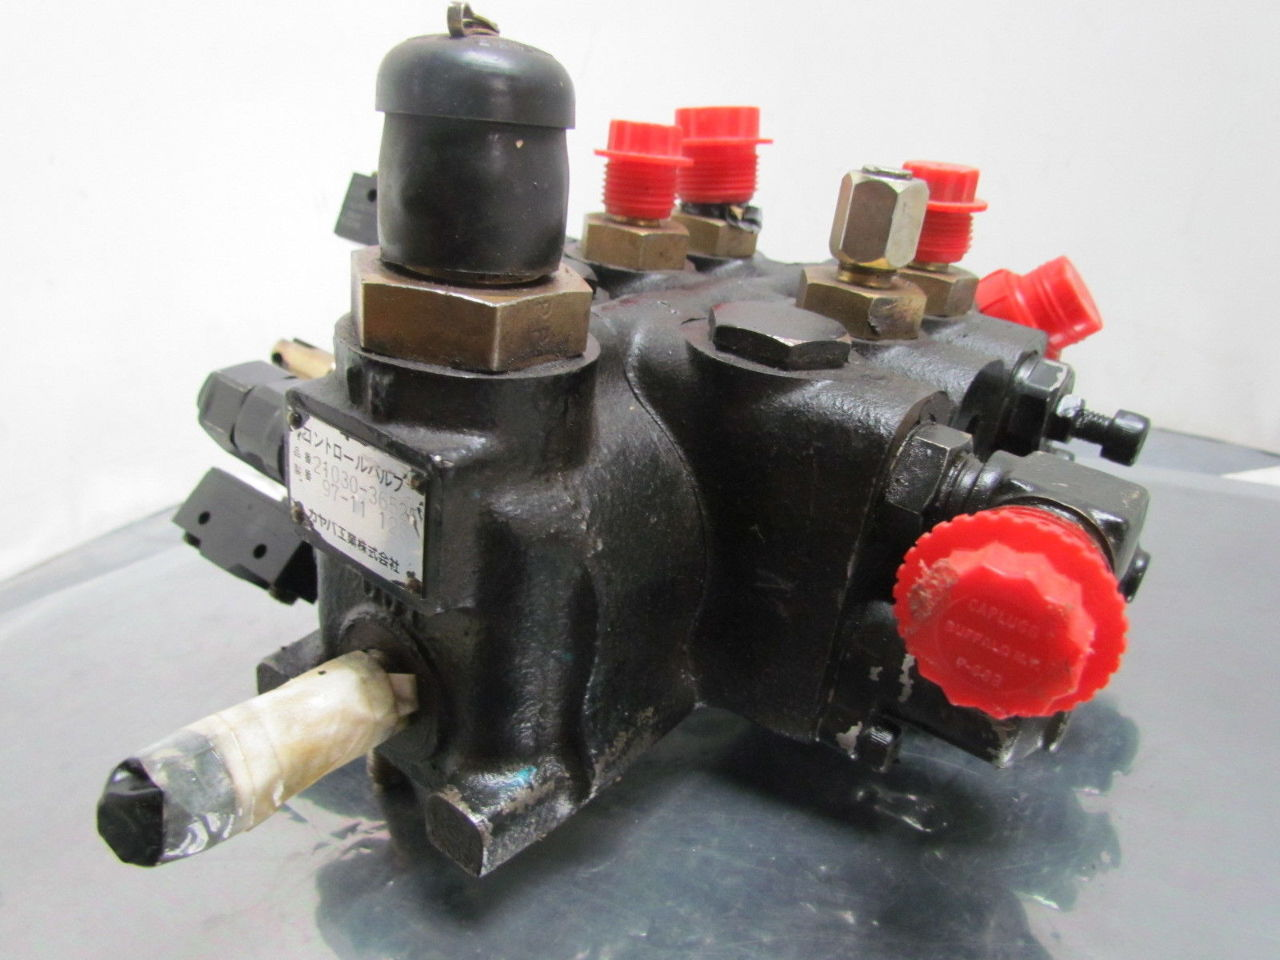 Caterpillar 21030 36525 3 spool hydraulic valve from a for Hydraulic motor spool valve